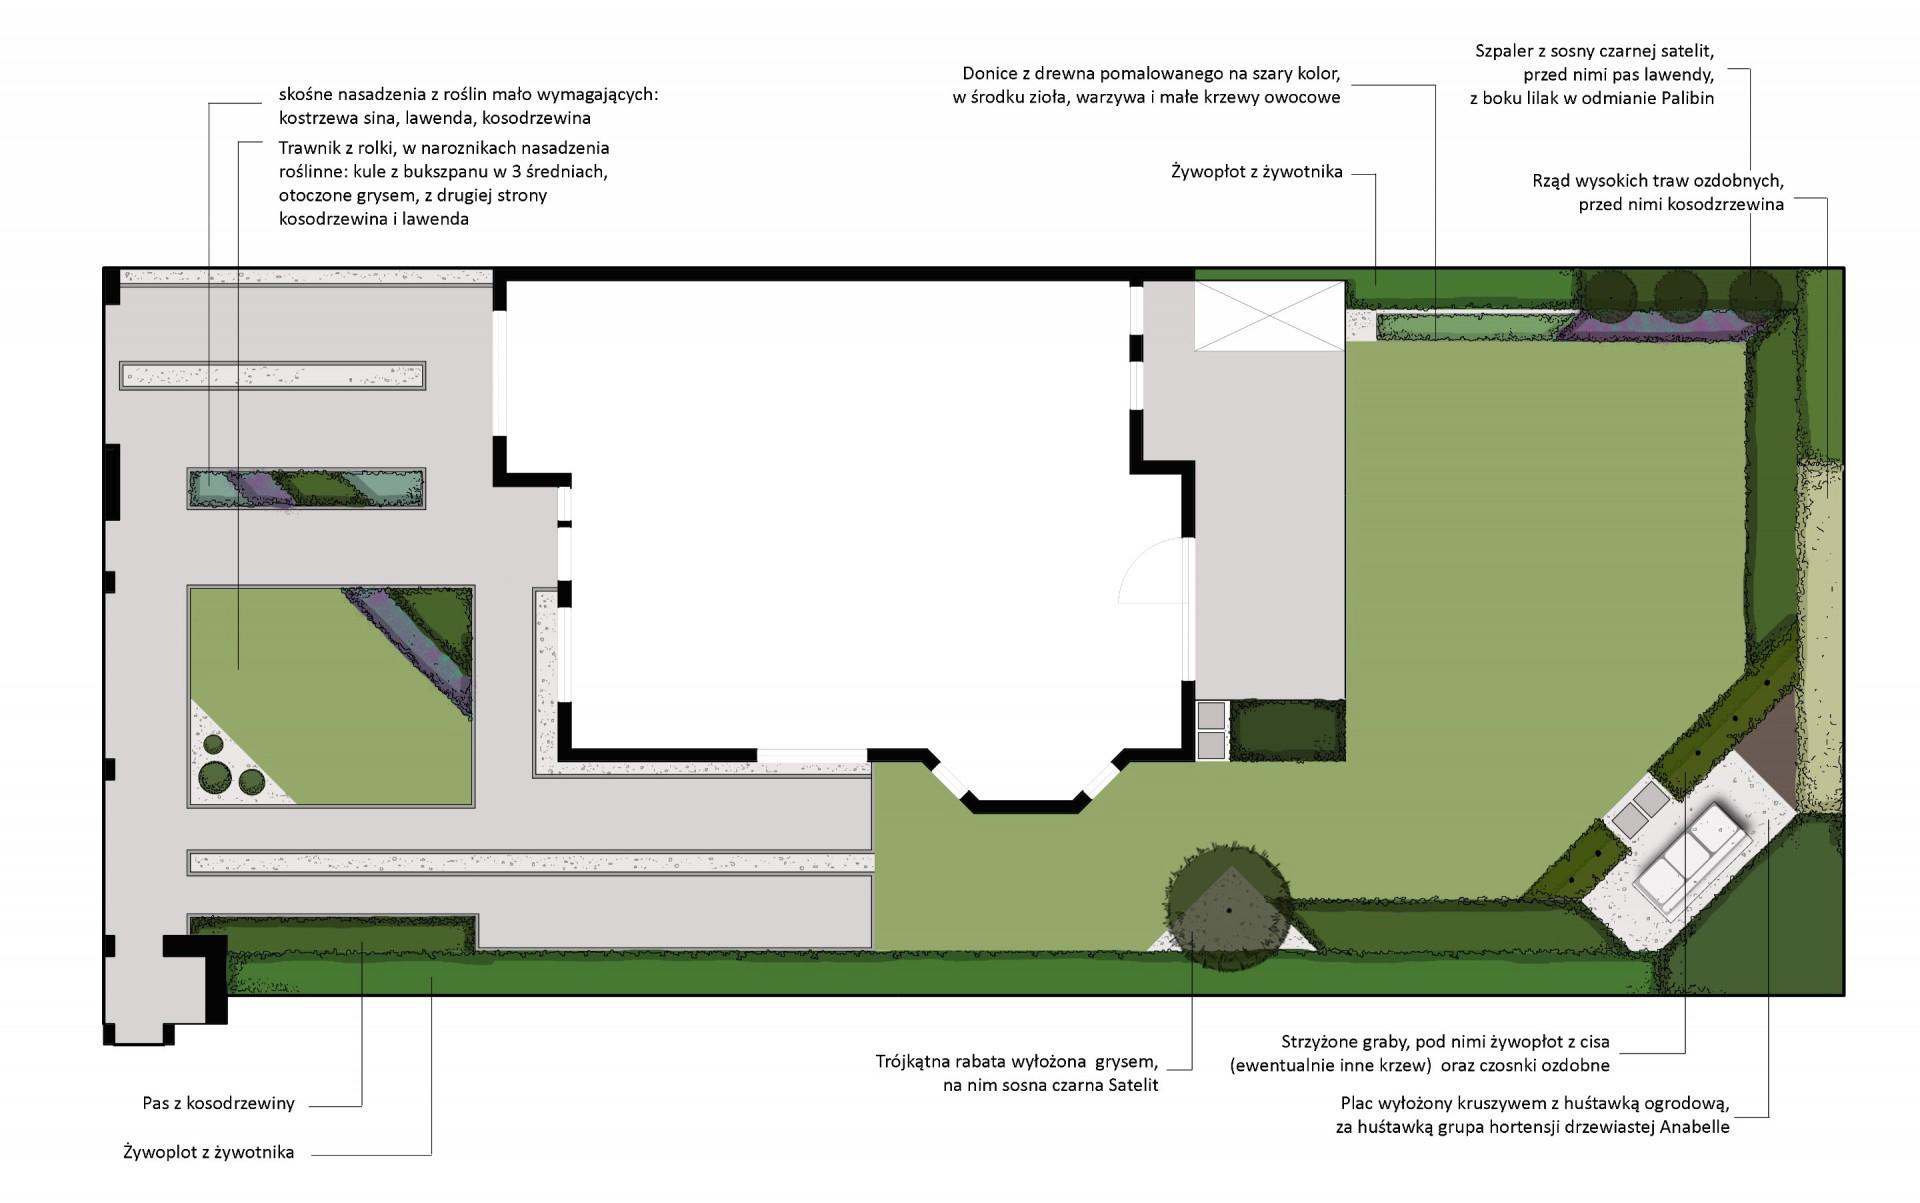 zahrada-navhr-projekt-zahrad-praha-ceska-republika-rock-and-flower-studio